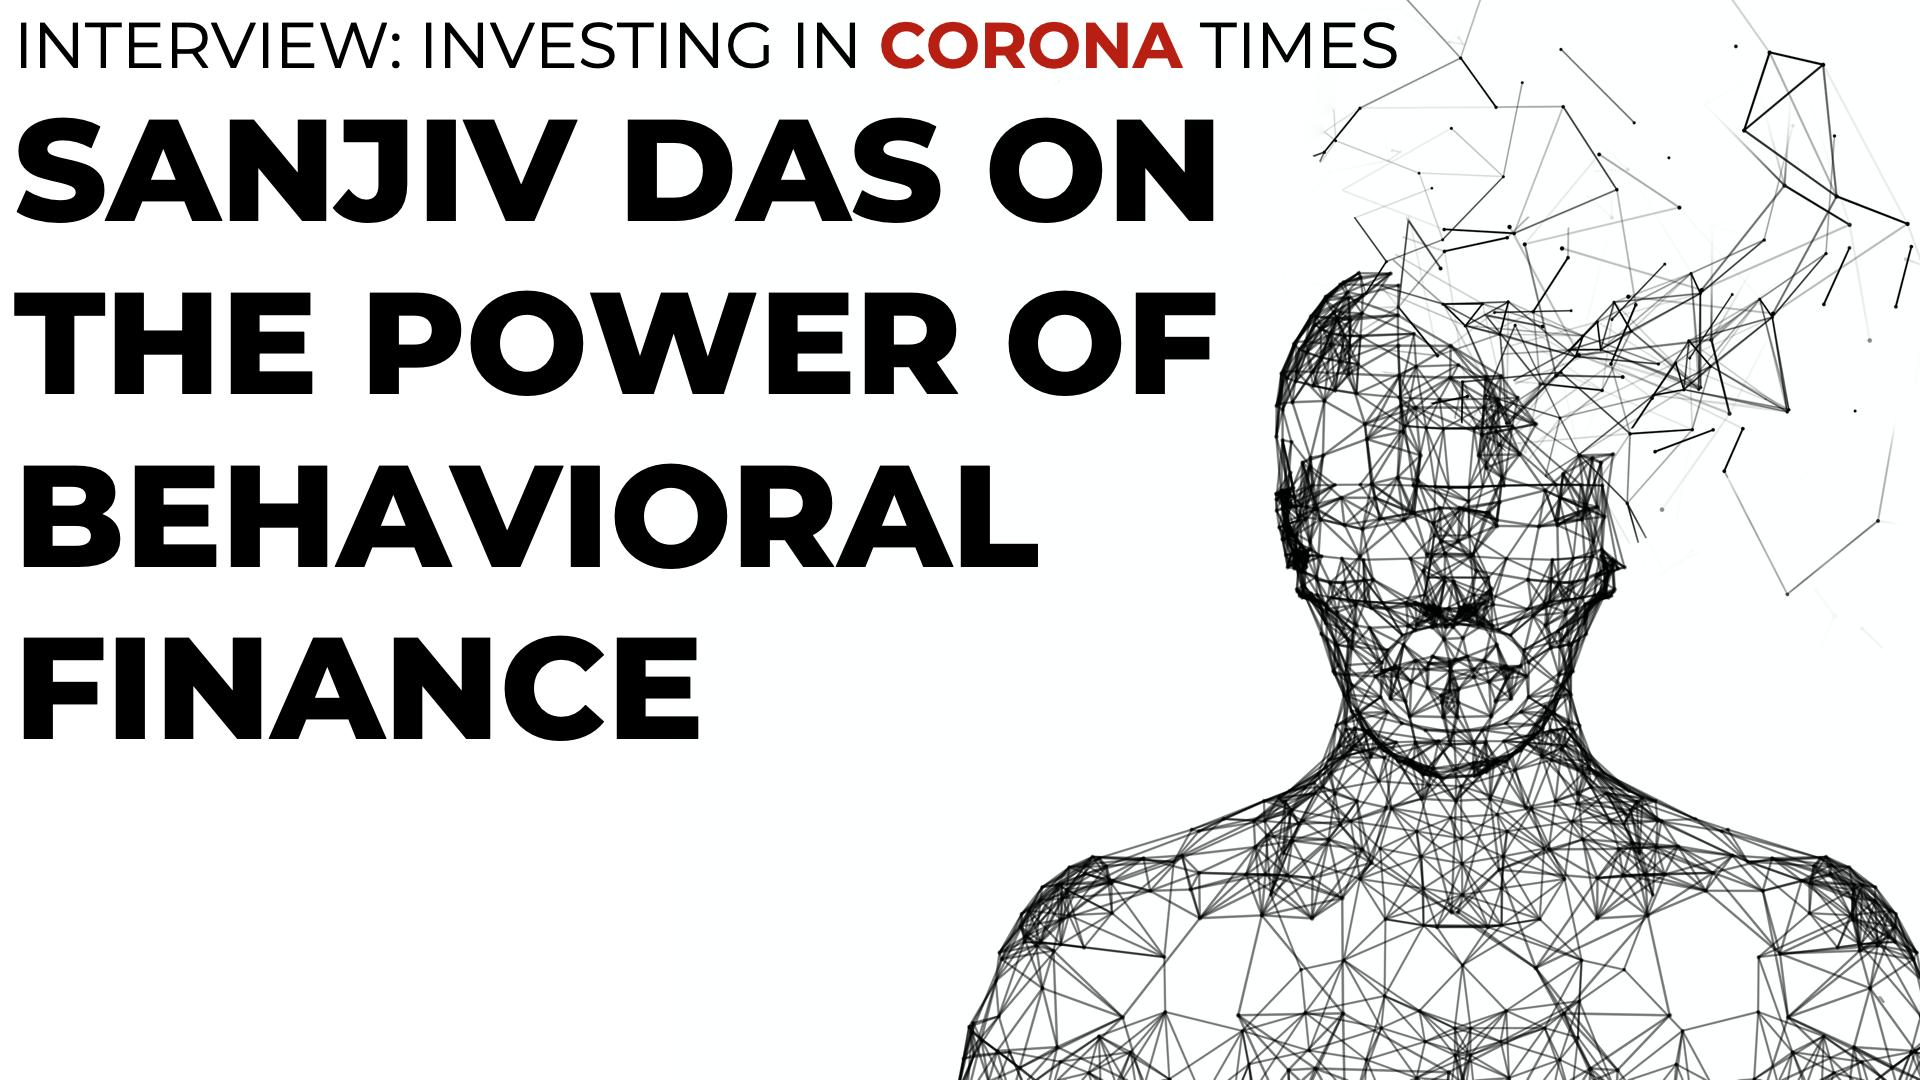 Sanjiv Das on the Power of Behavioral Finance